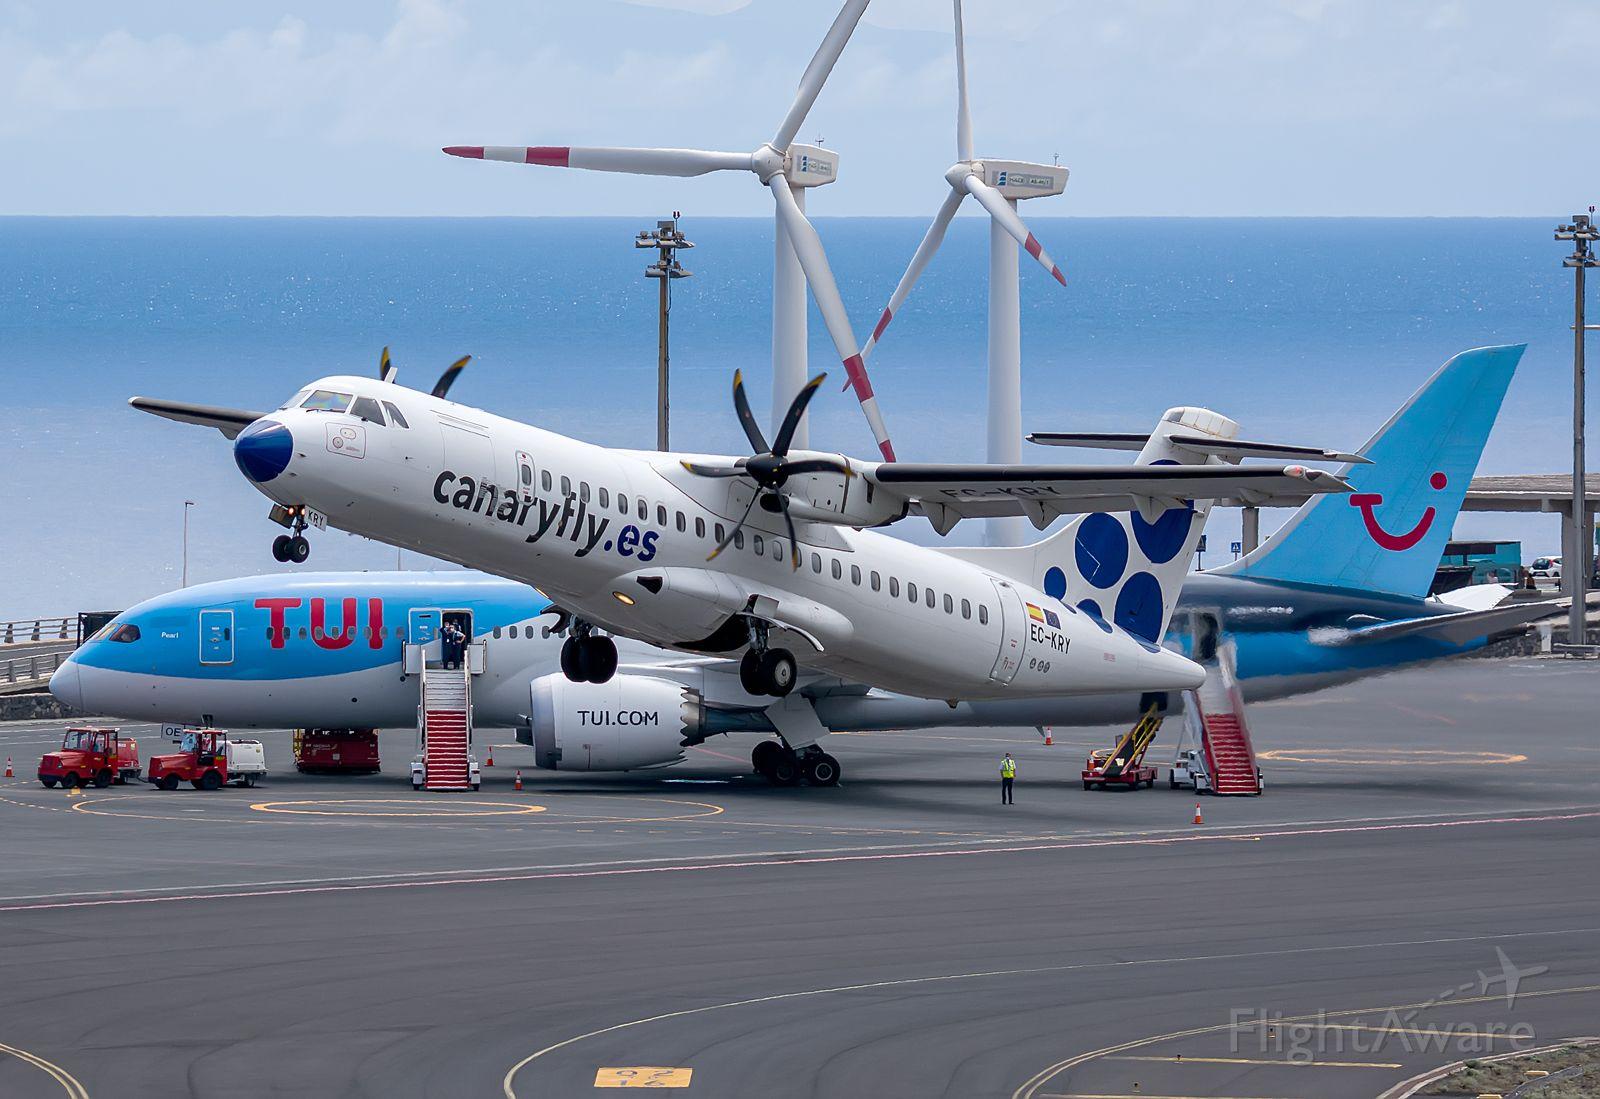 Aerospatiale ATR-42-300 (EC-KRY)